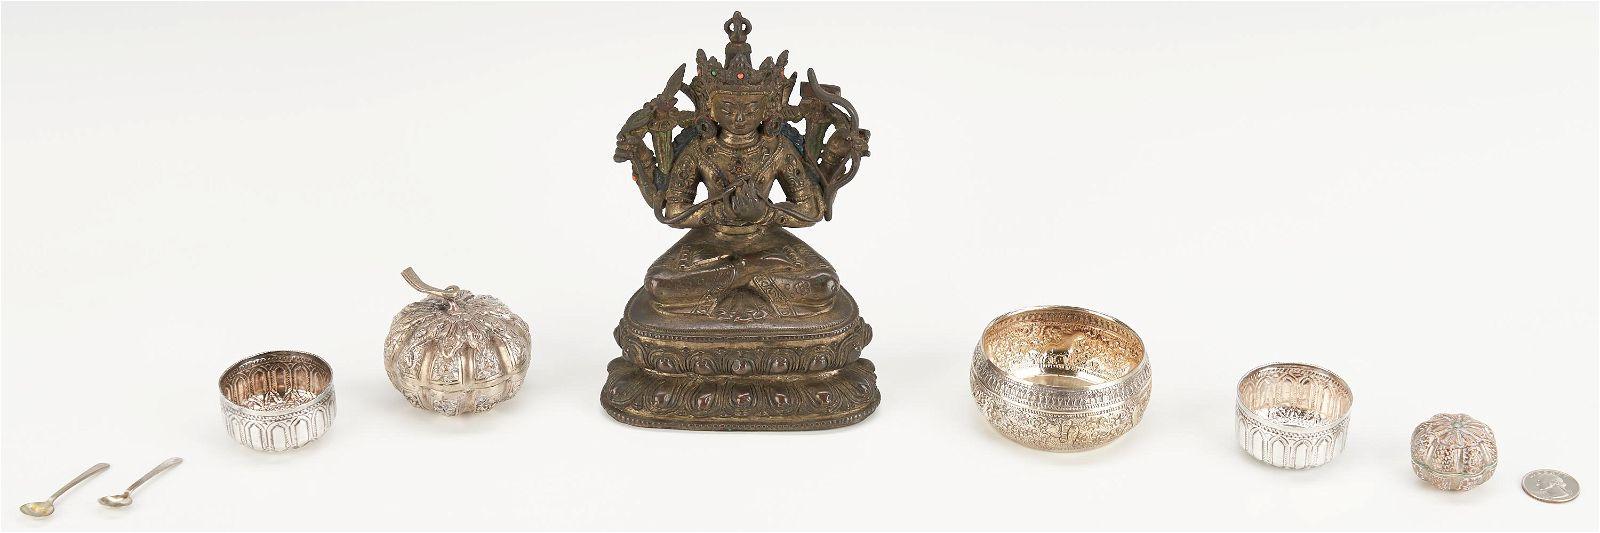 8 Asian Items, Incl. Bronze Buddha & Burmese Silver